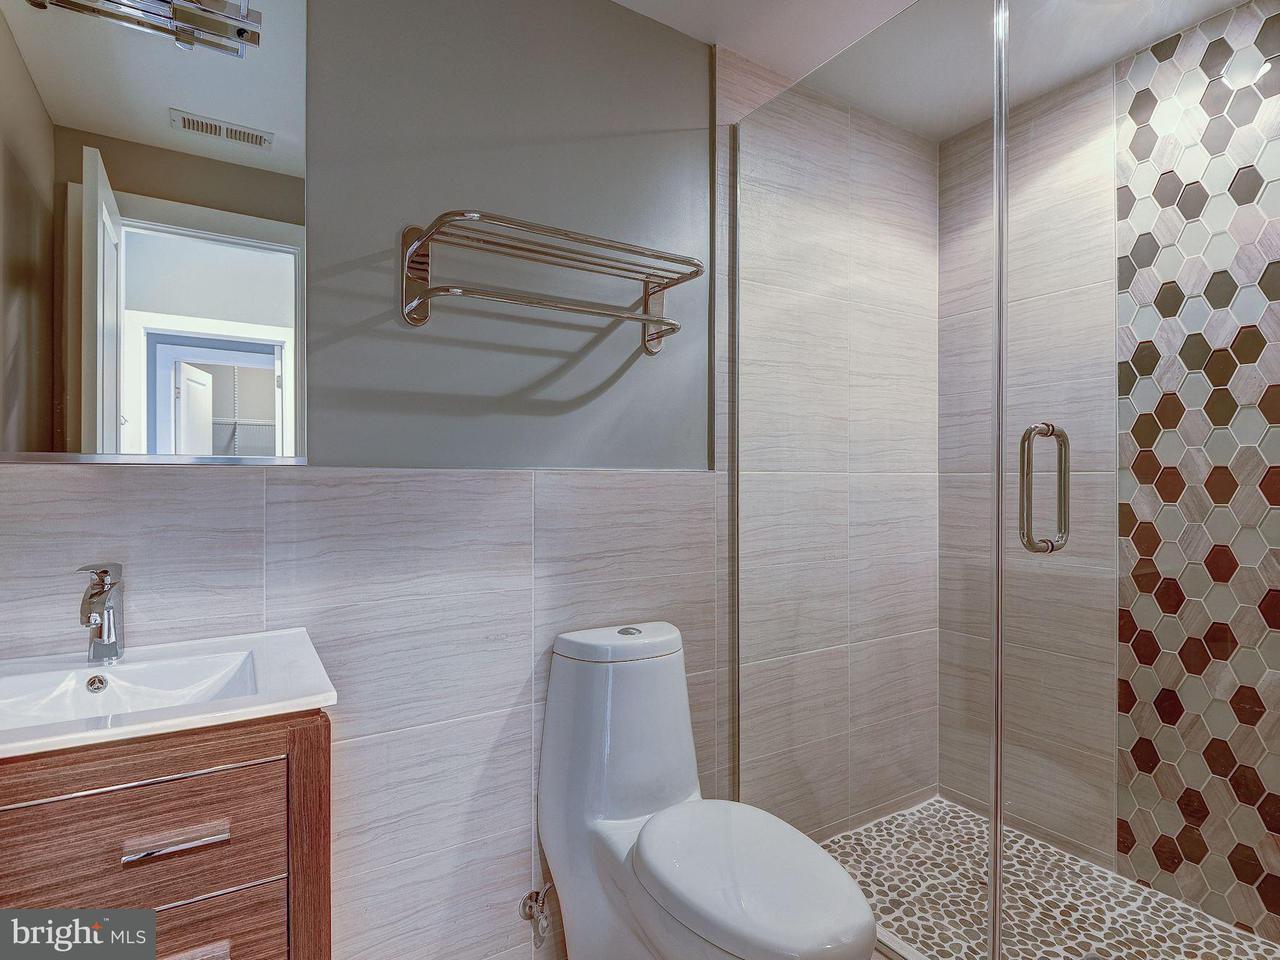 Additional photo for property listing at 3415 14th St Nw #3 3415 14th St Nw #3 Washington, Distretto Di Columbia 20010 Stati Uniti